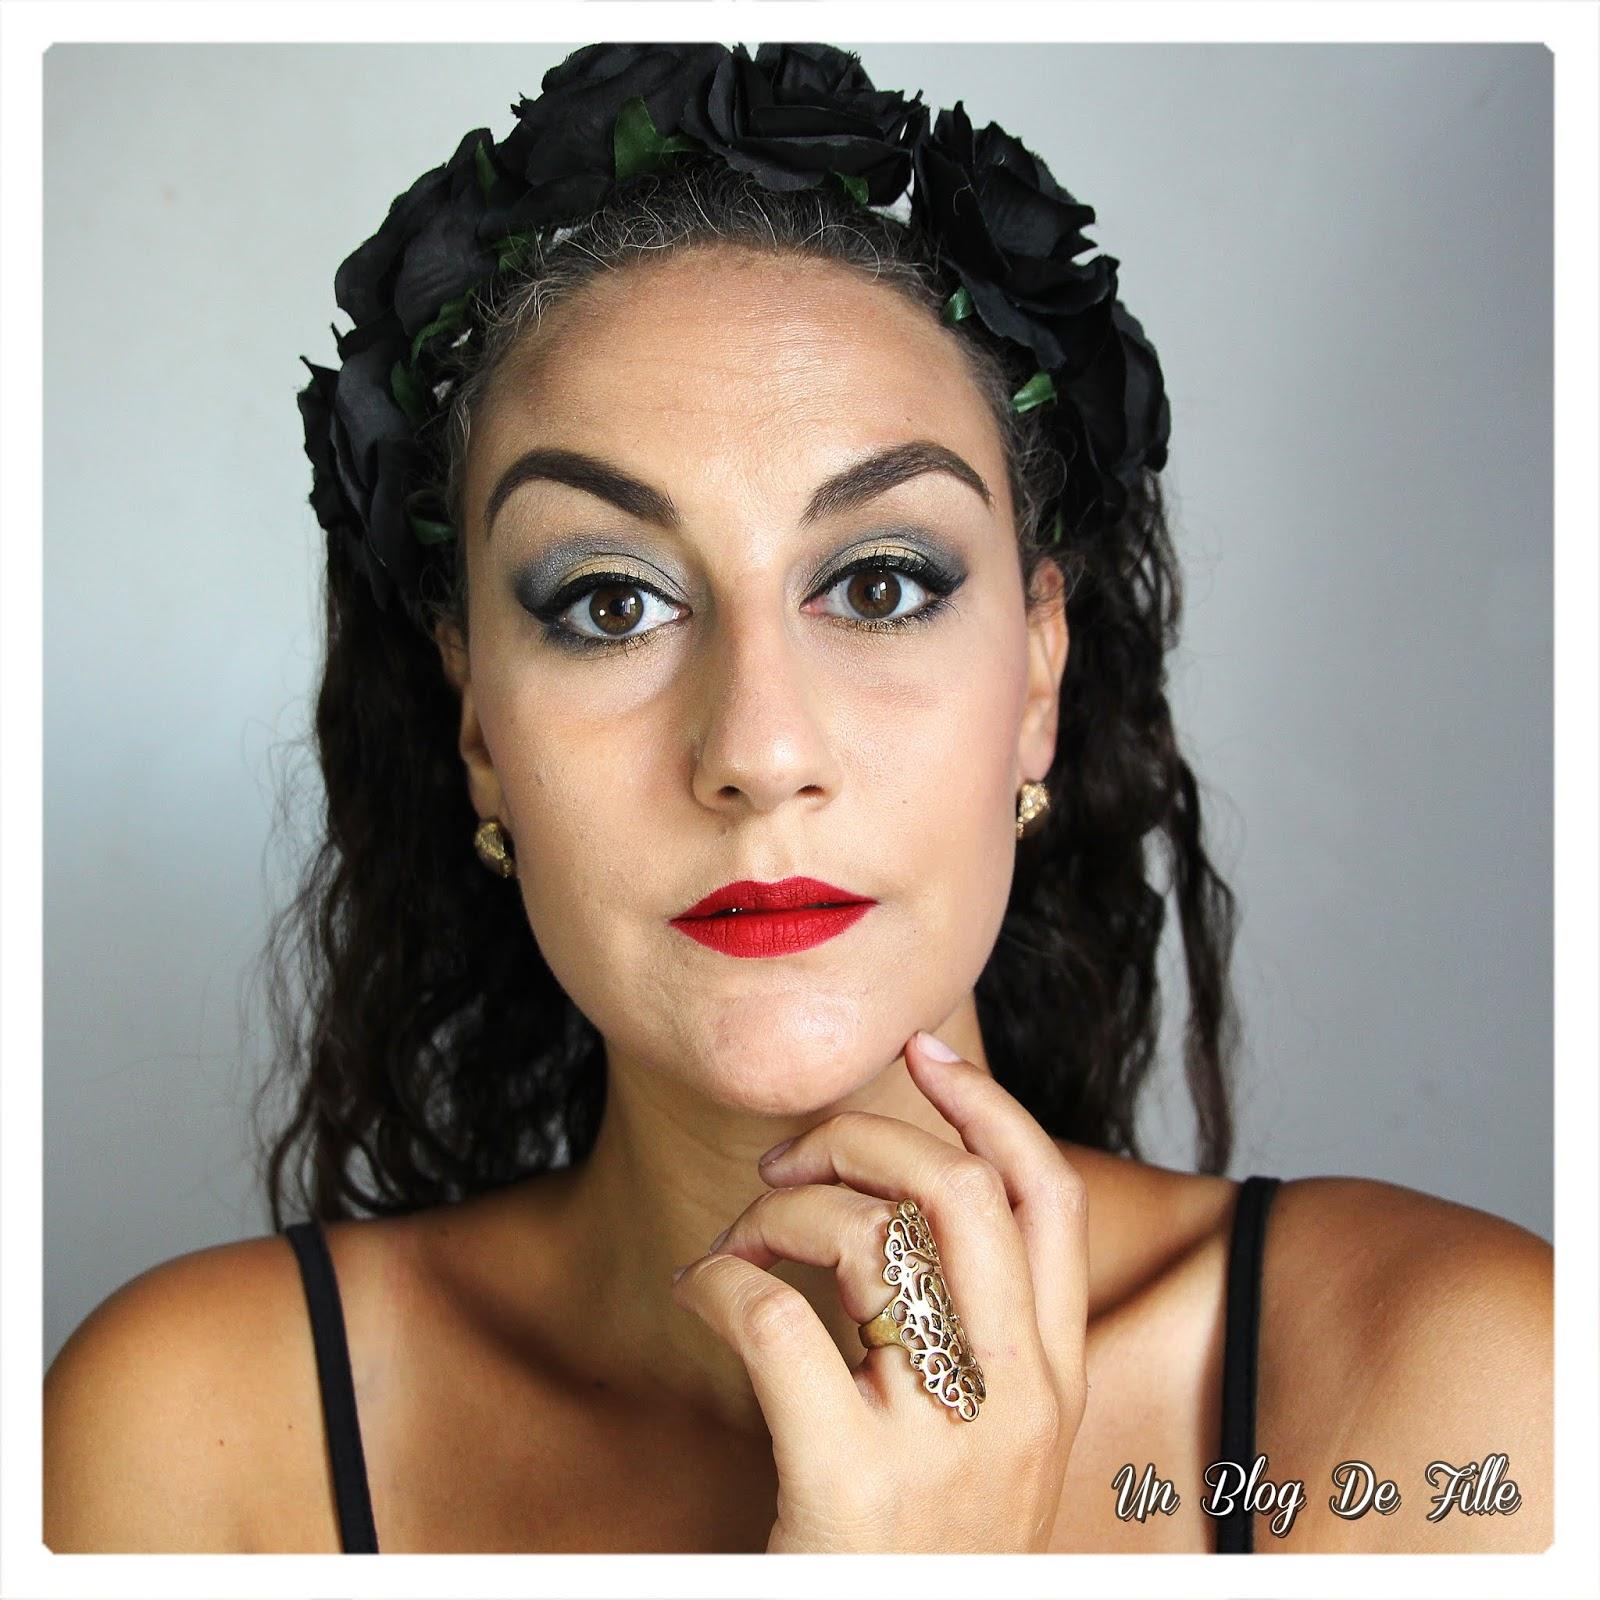 http://www.unblogdefille.fr/2018/09/maquillage-gris-anthracite-et-or-msc.html